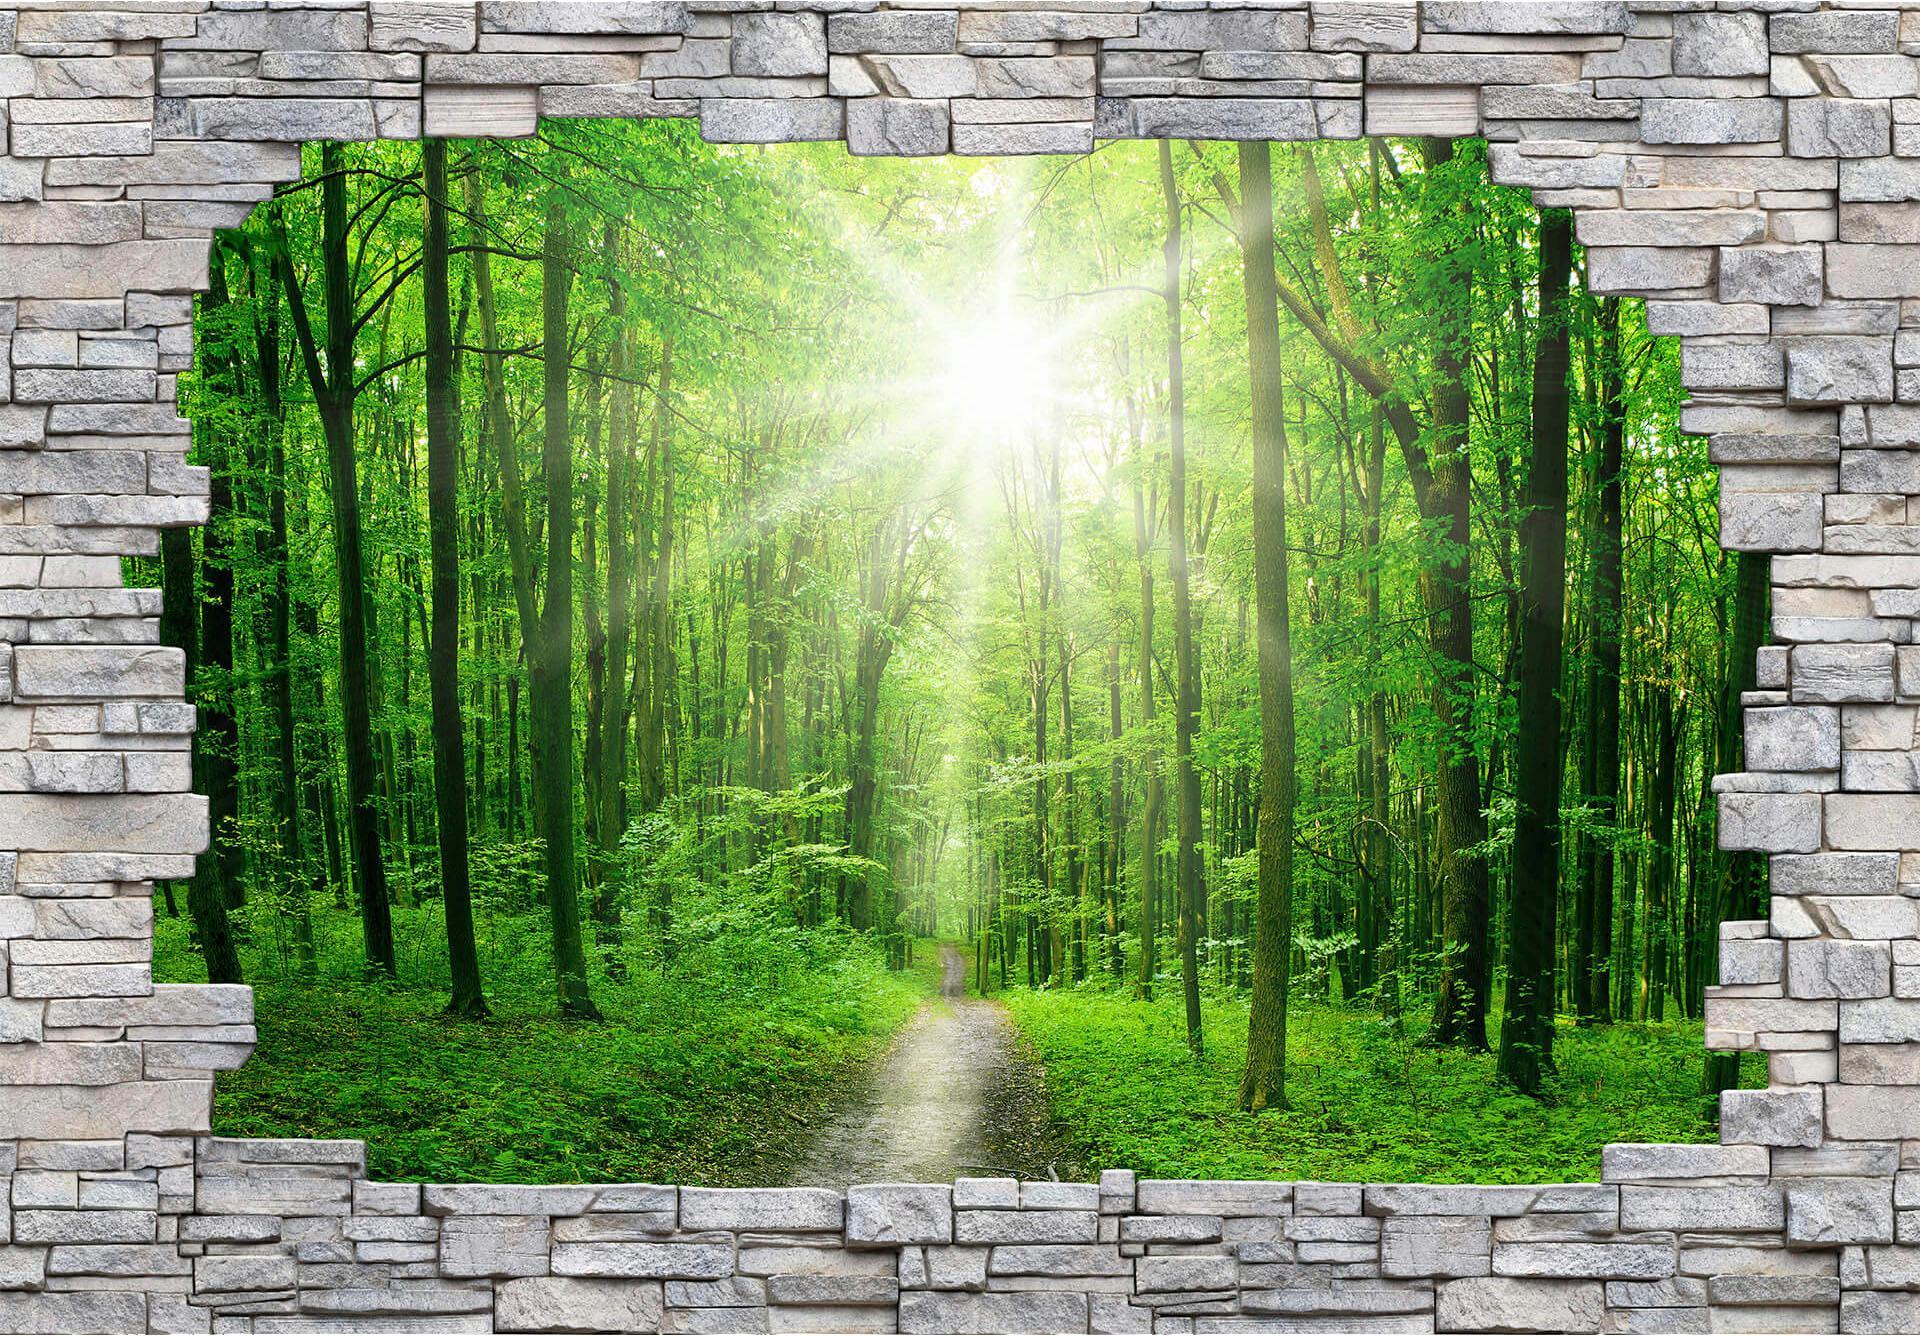 Fototapete 3D Sunny Forest Mauer grün Fototapeten Tapeten Bauen Renovieren